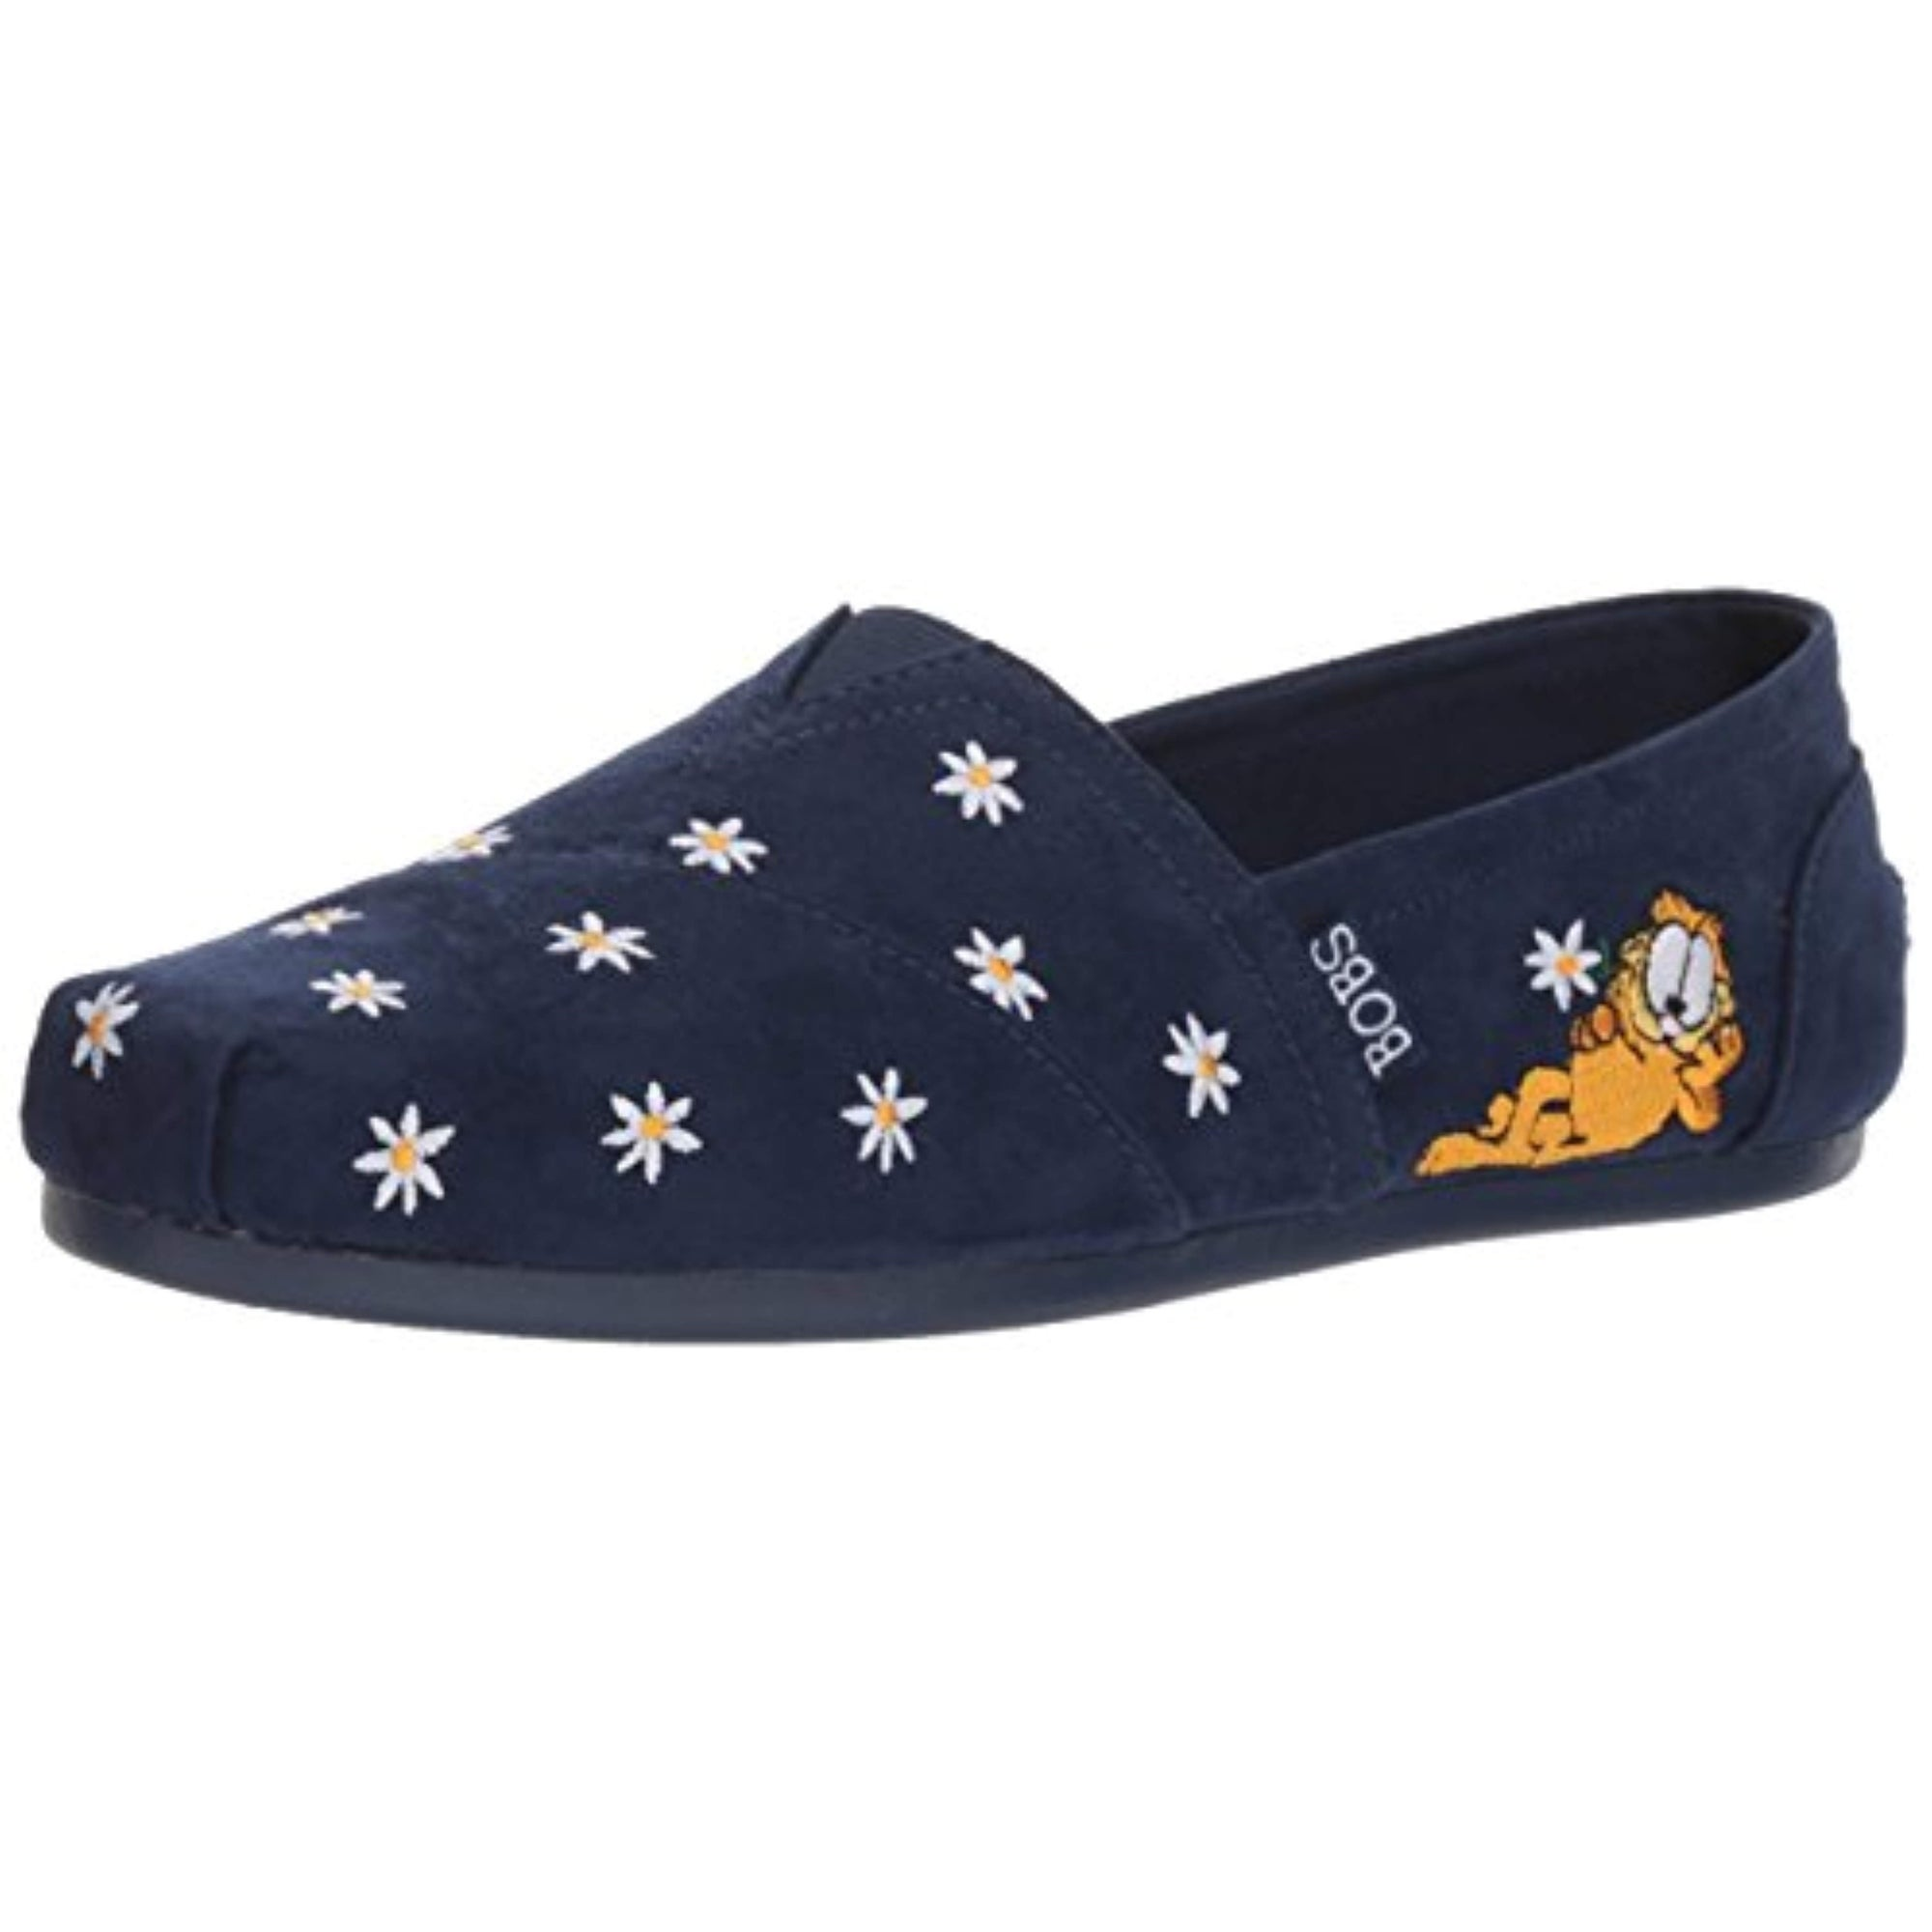 memory foam Shoe, nvy